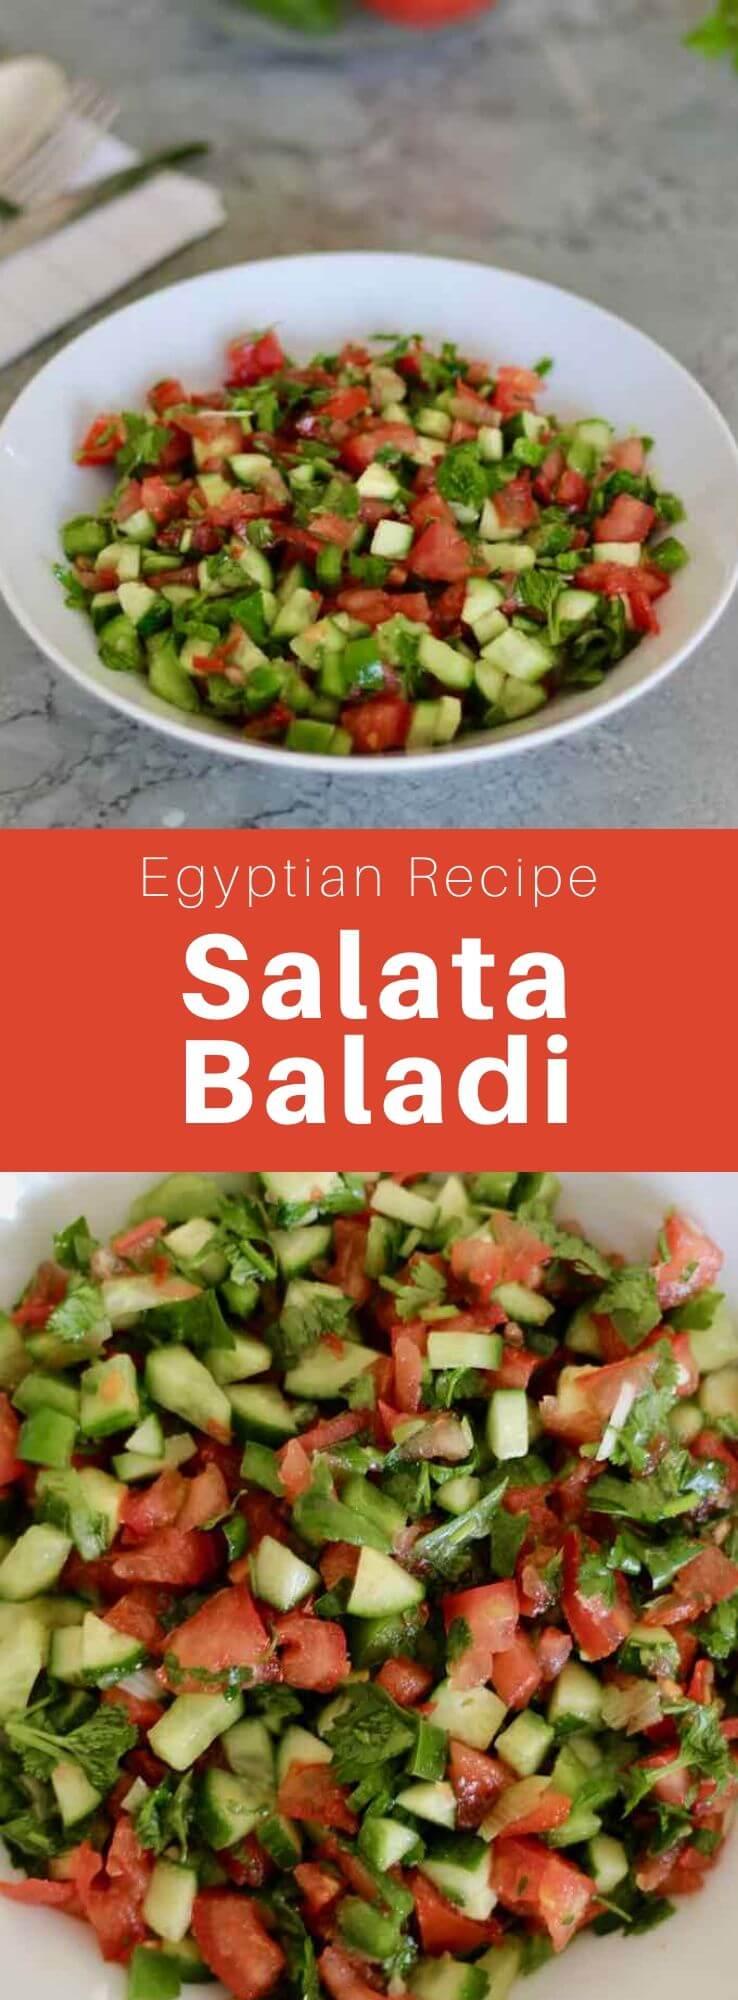 Salata baladi (سلطة البلدي), or salata arbya (سلطة عربية) is an Arab raw vegetable salad popular in Egypt, the Middle East and North Africa. #Egypt #EgyptianCuisine #EgyptianFood #EgyptianRecipe #WorldCuisine #196flavors